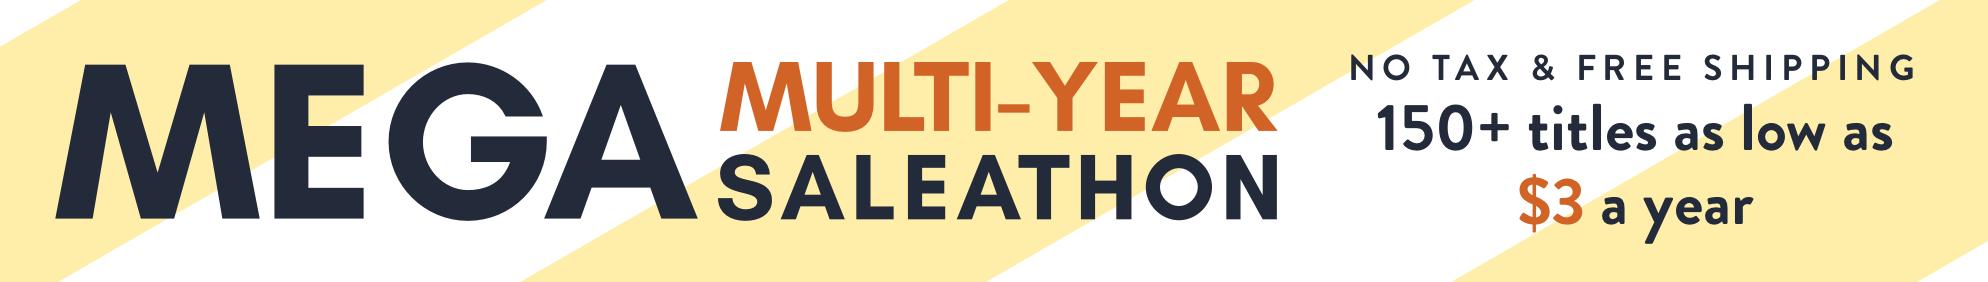 Multi-Year Sale- Aug 2017